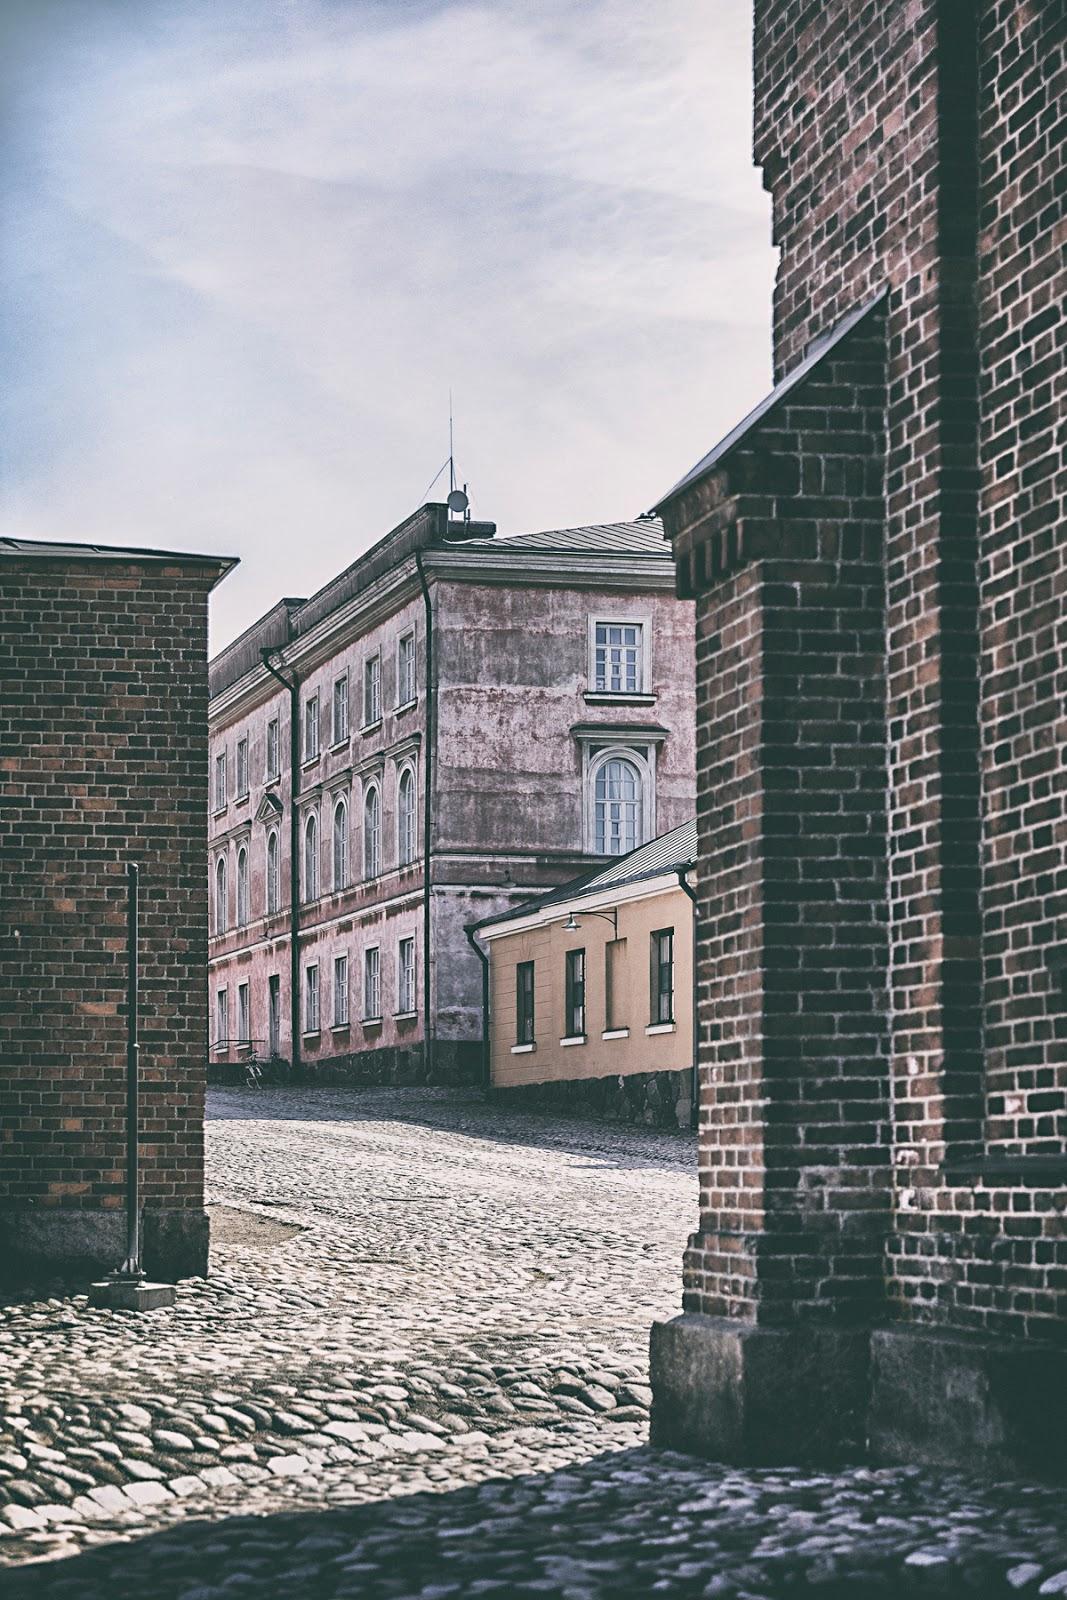 Suomenlinna, Helsinki, Sveaborg, visithelsinki, island, saari, Visualaddict, valokuvaaja, Frida Steiner, photographer, visualaddictfrida, tourism, worthvisiting,